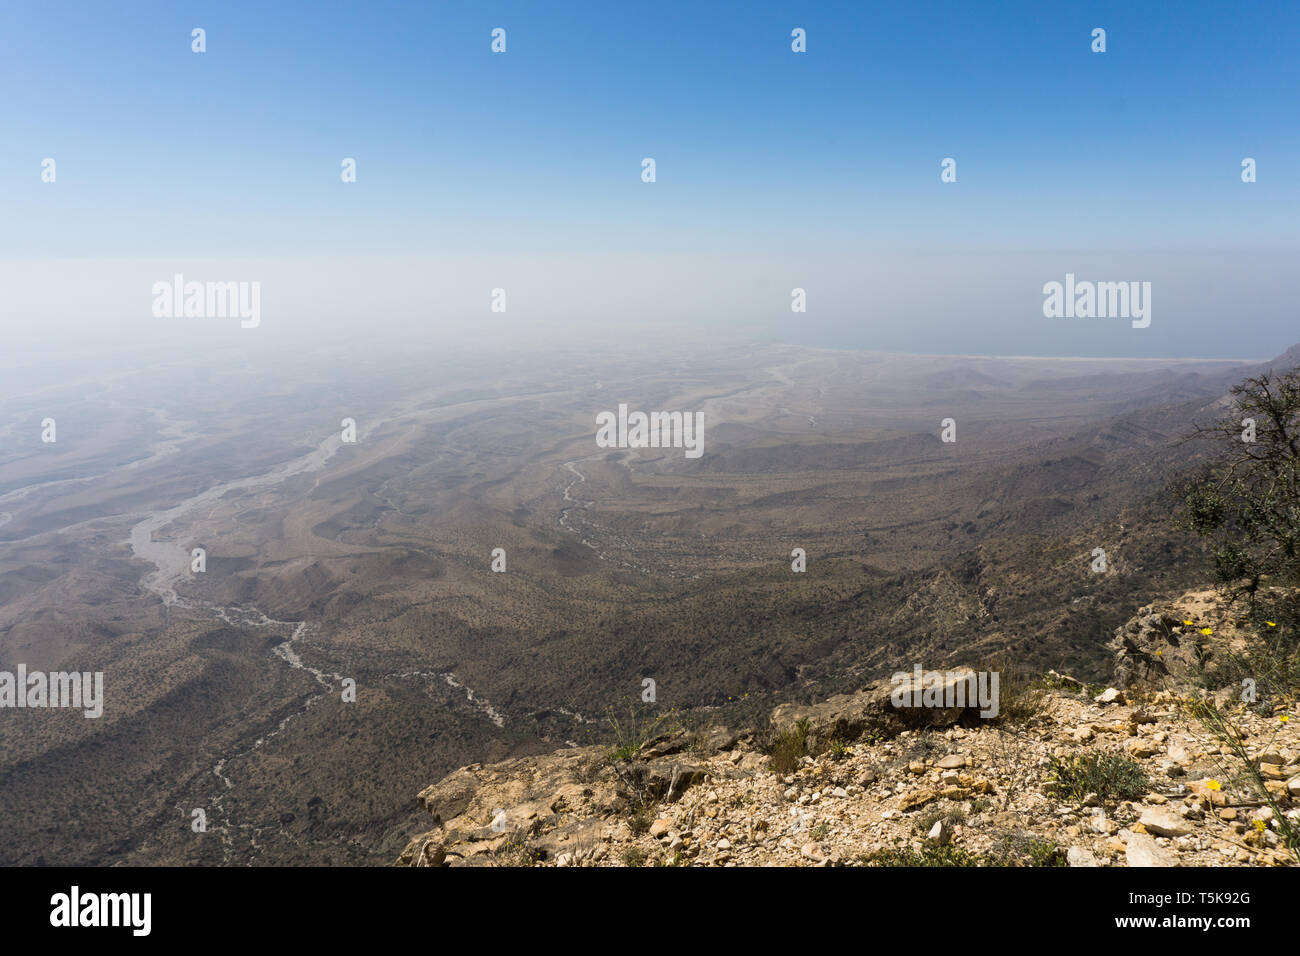 Jabal Samhan viewpoint, Dhorfar, Oman Stock Photo